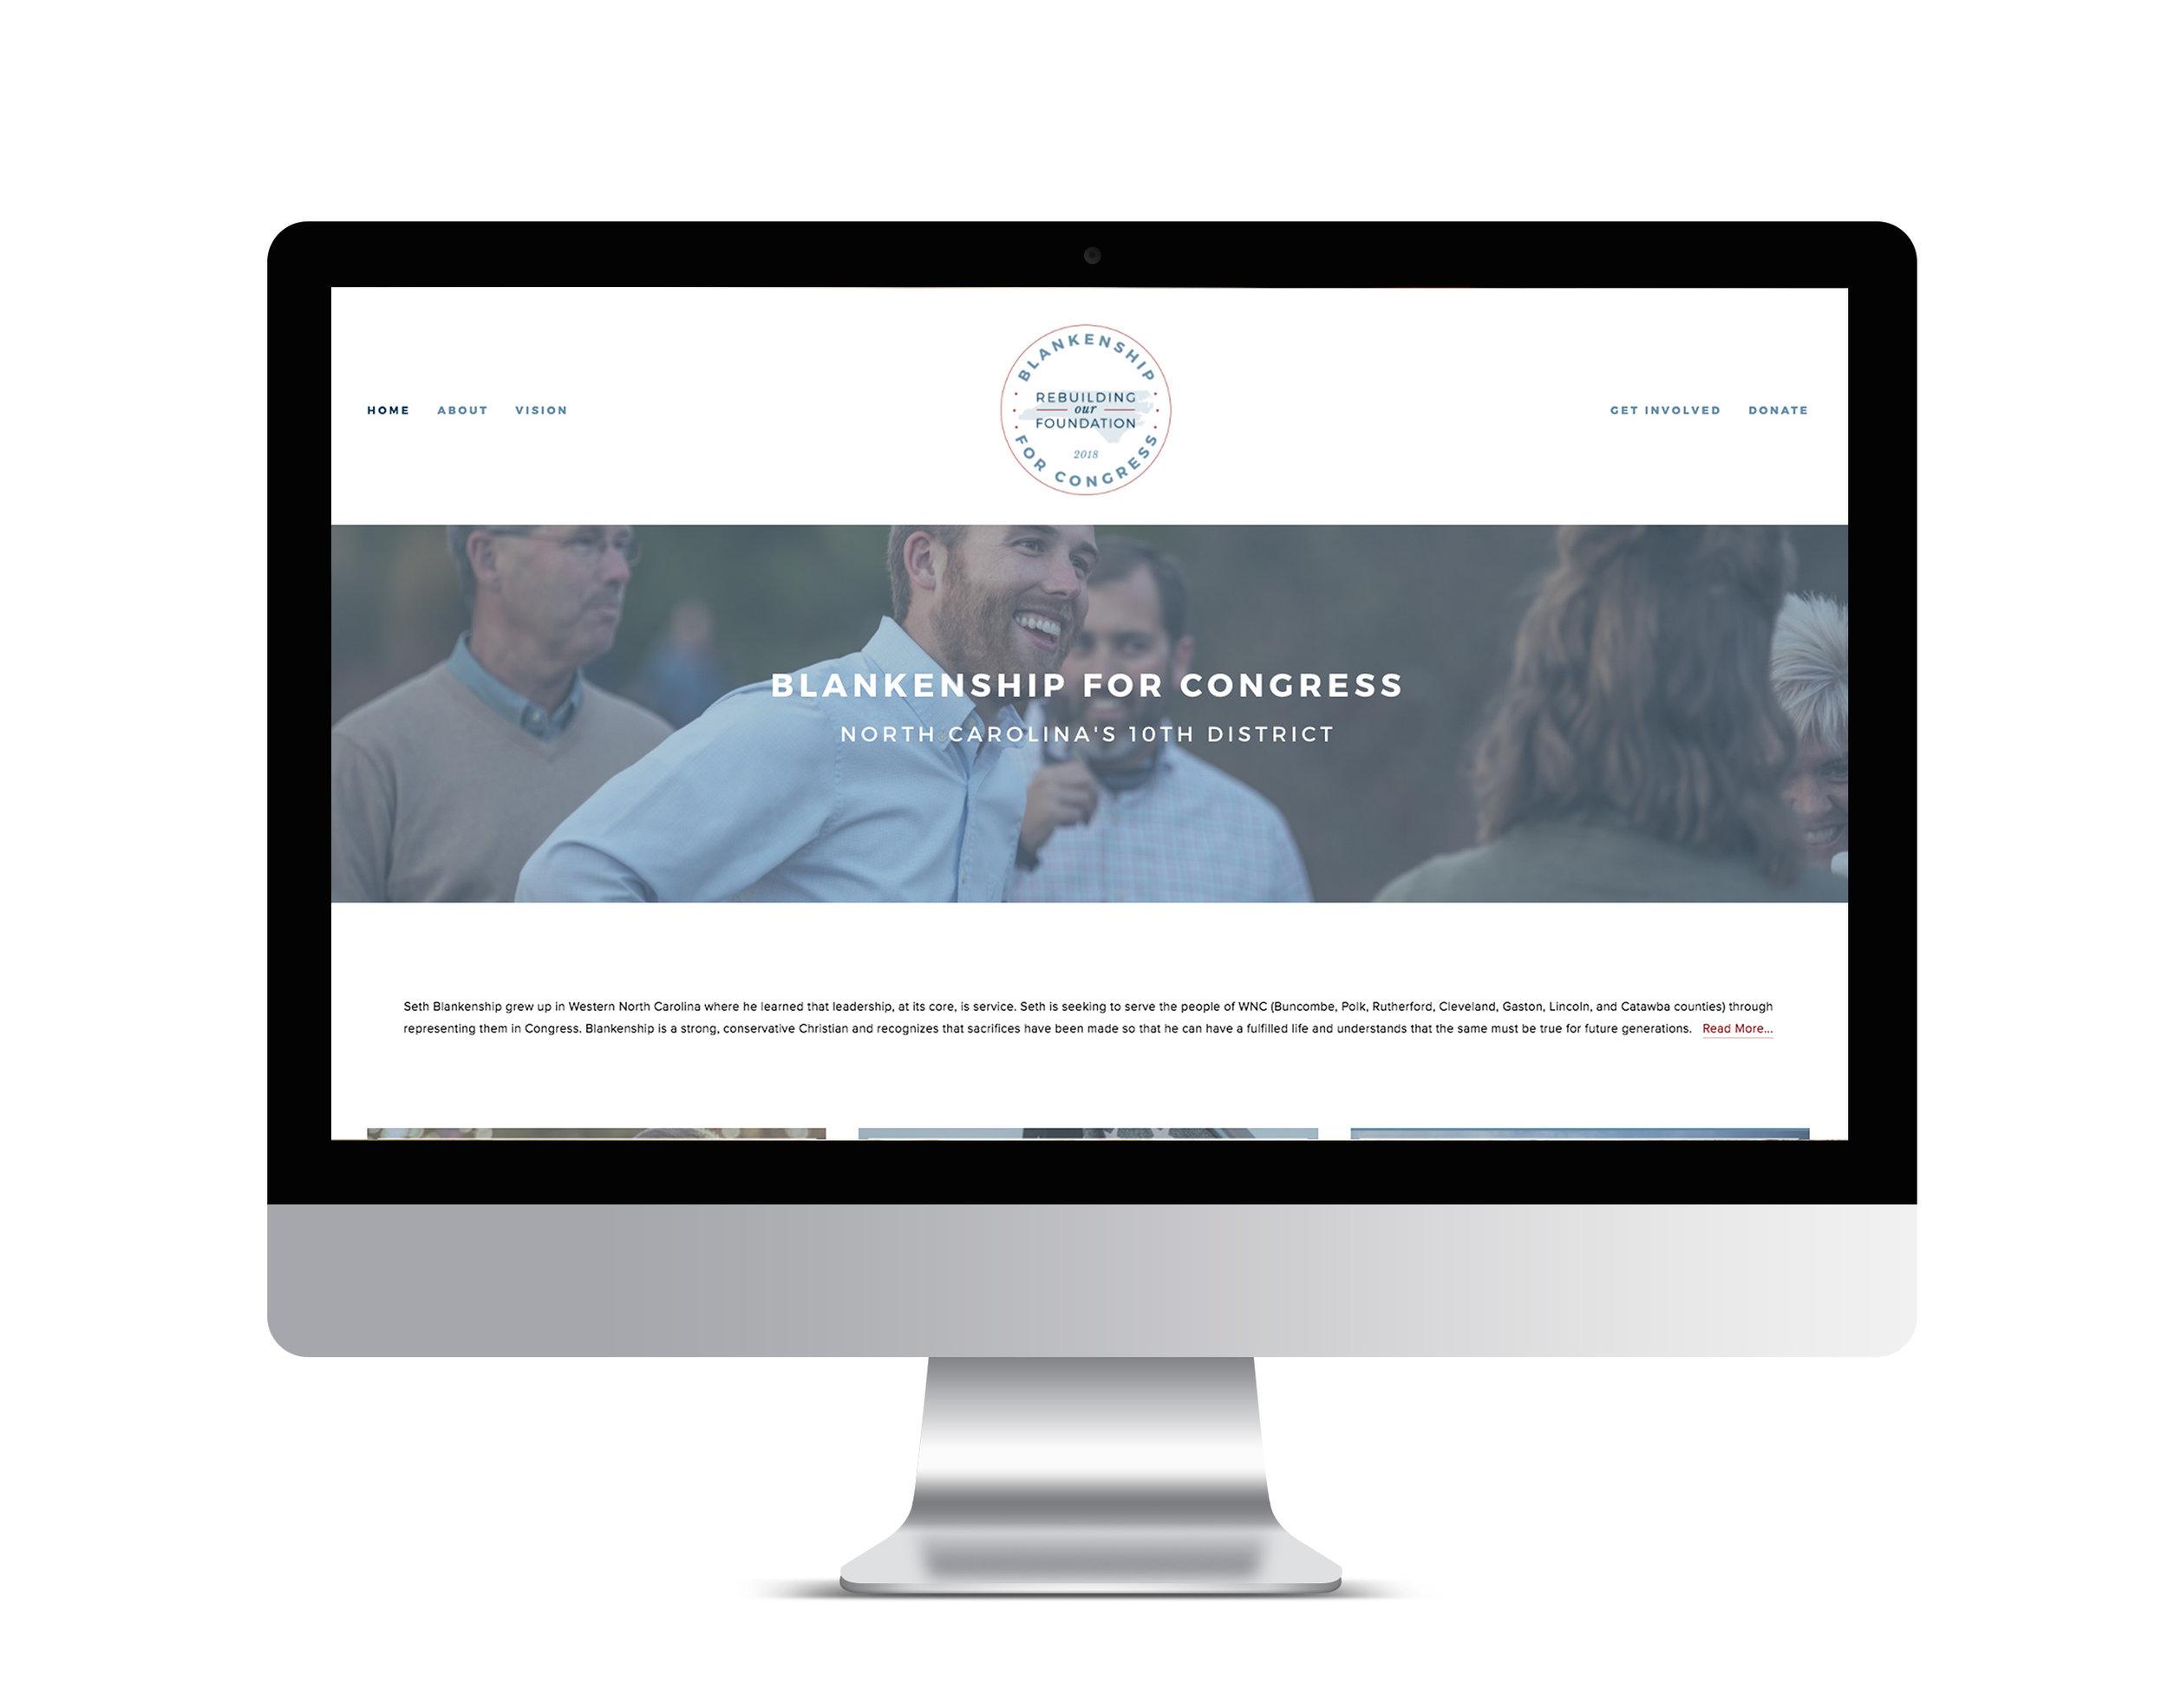 Website | Blankenship for Congress | www.blankenshipforcongress.com